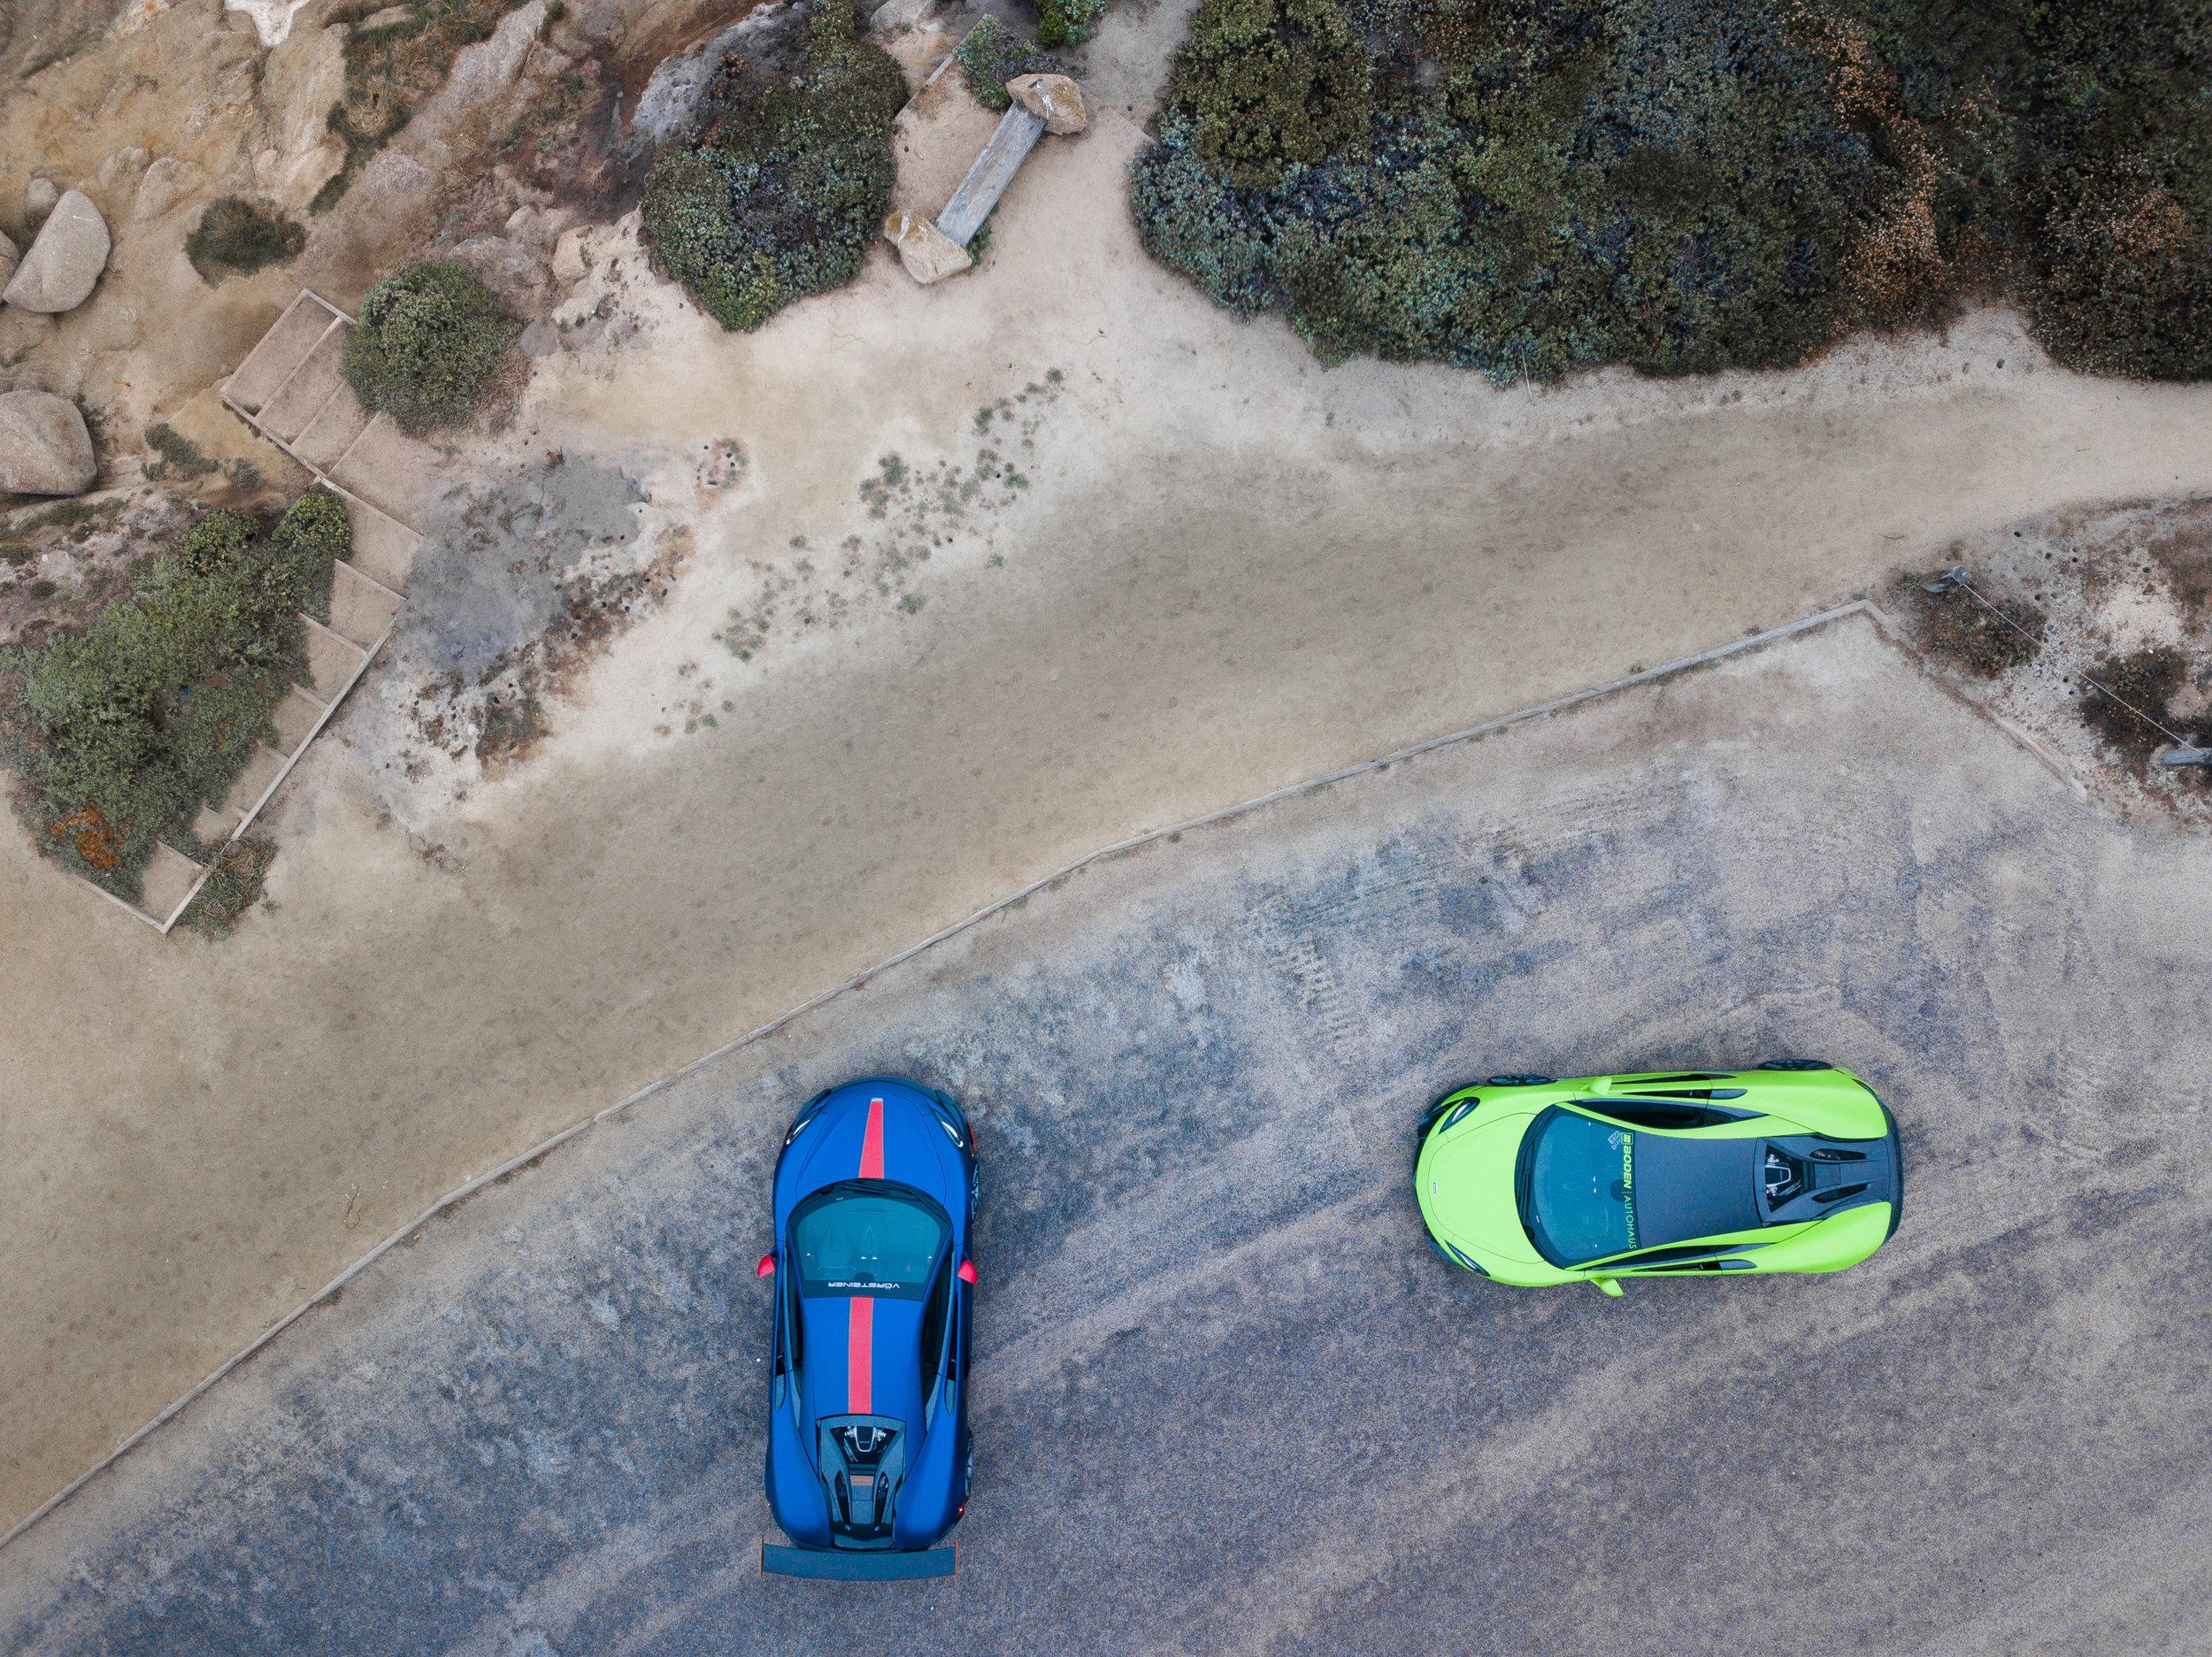 Stay_Driven_Monterey_Mclarens_DRONE-21.jpg